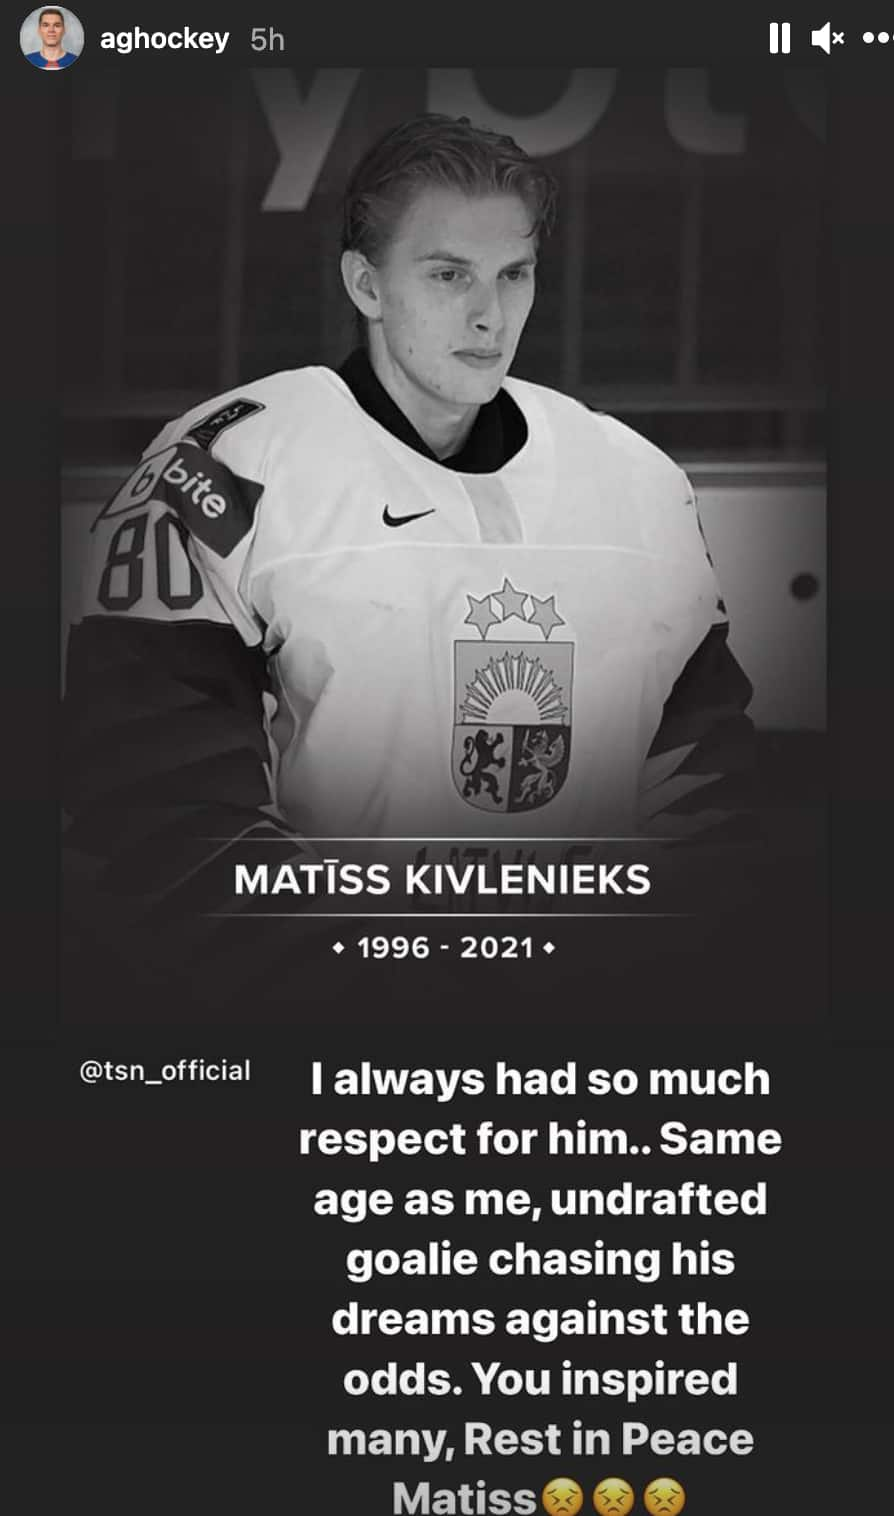 Matiss Kivlenieks